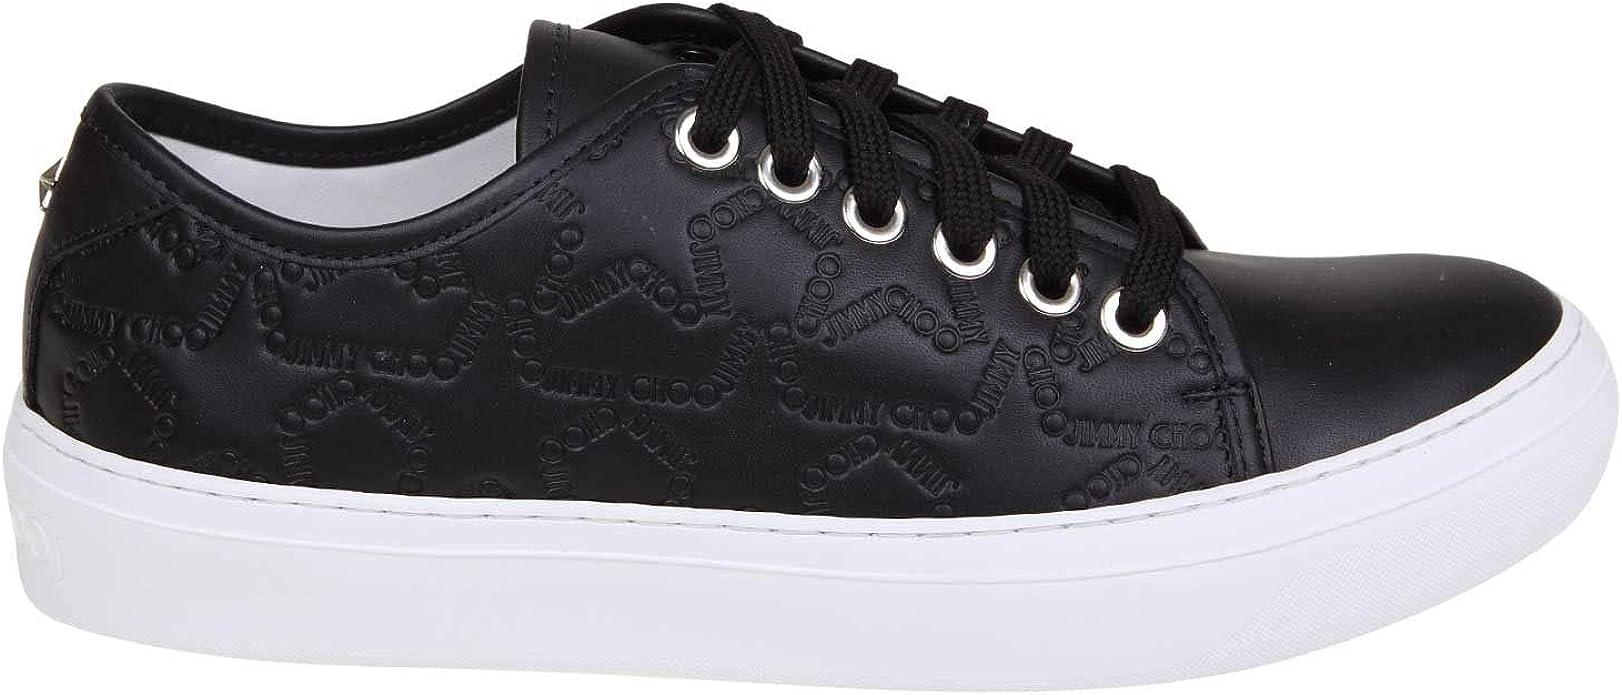 JIMMY CHOO Luxury Fashion Mens Sneakers Summer Black